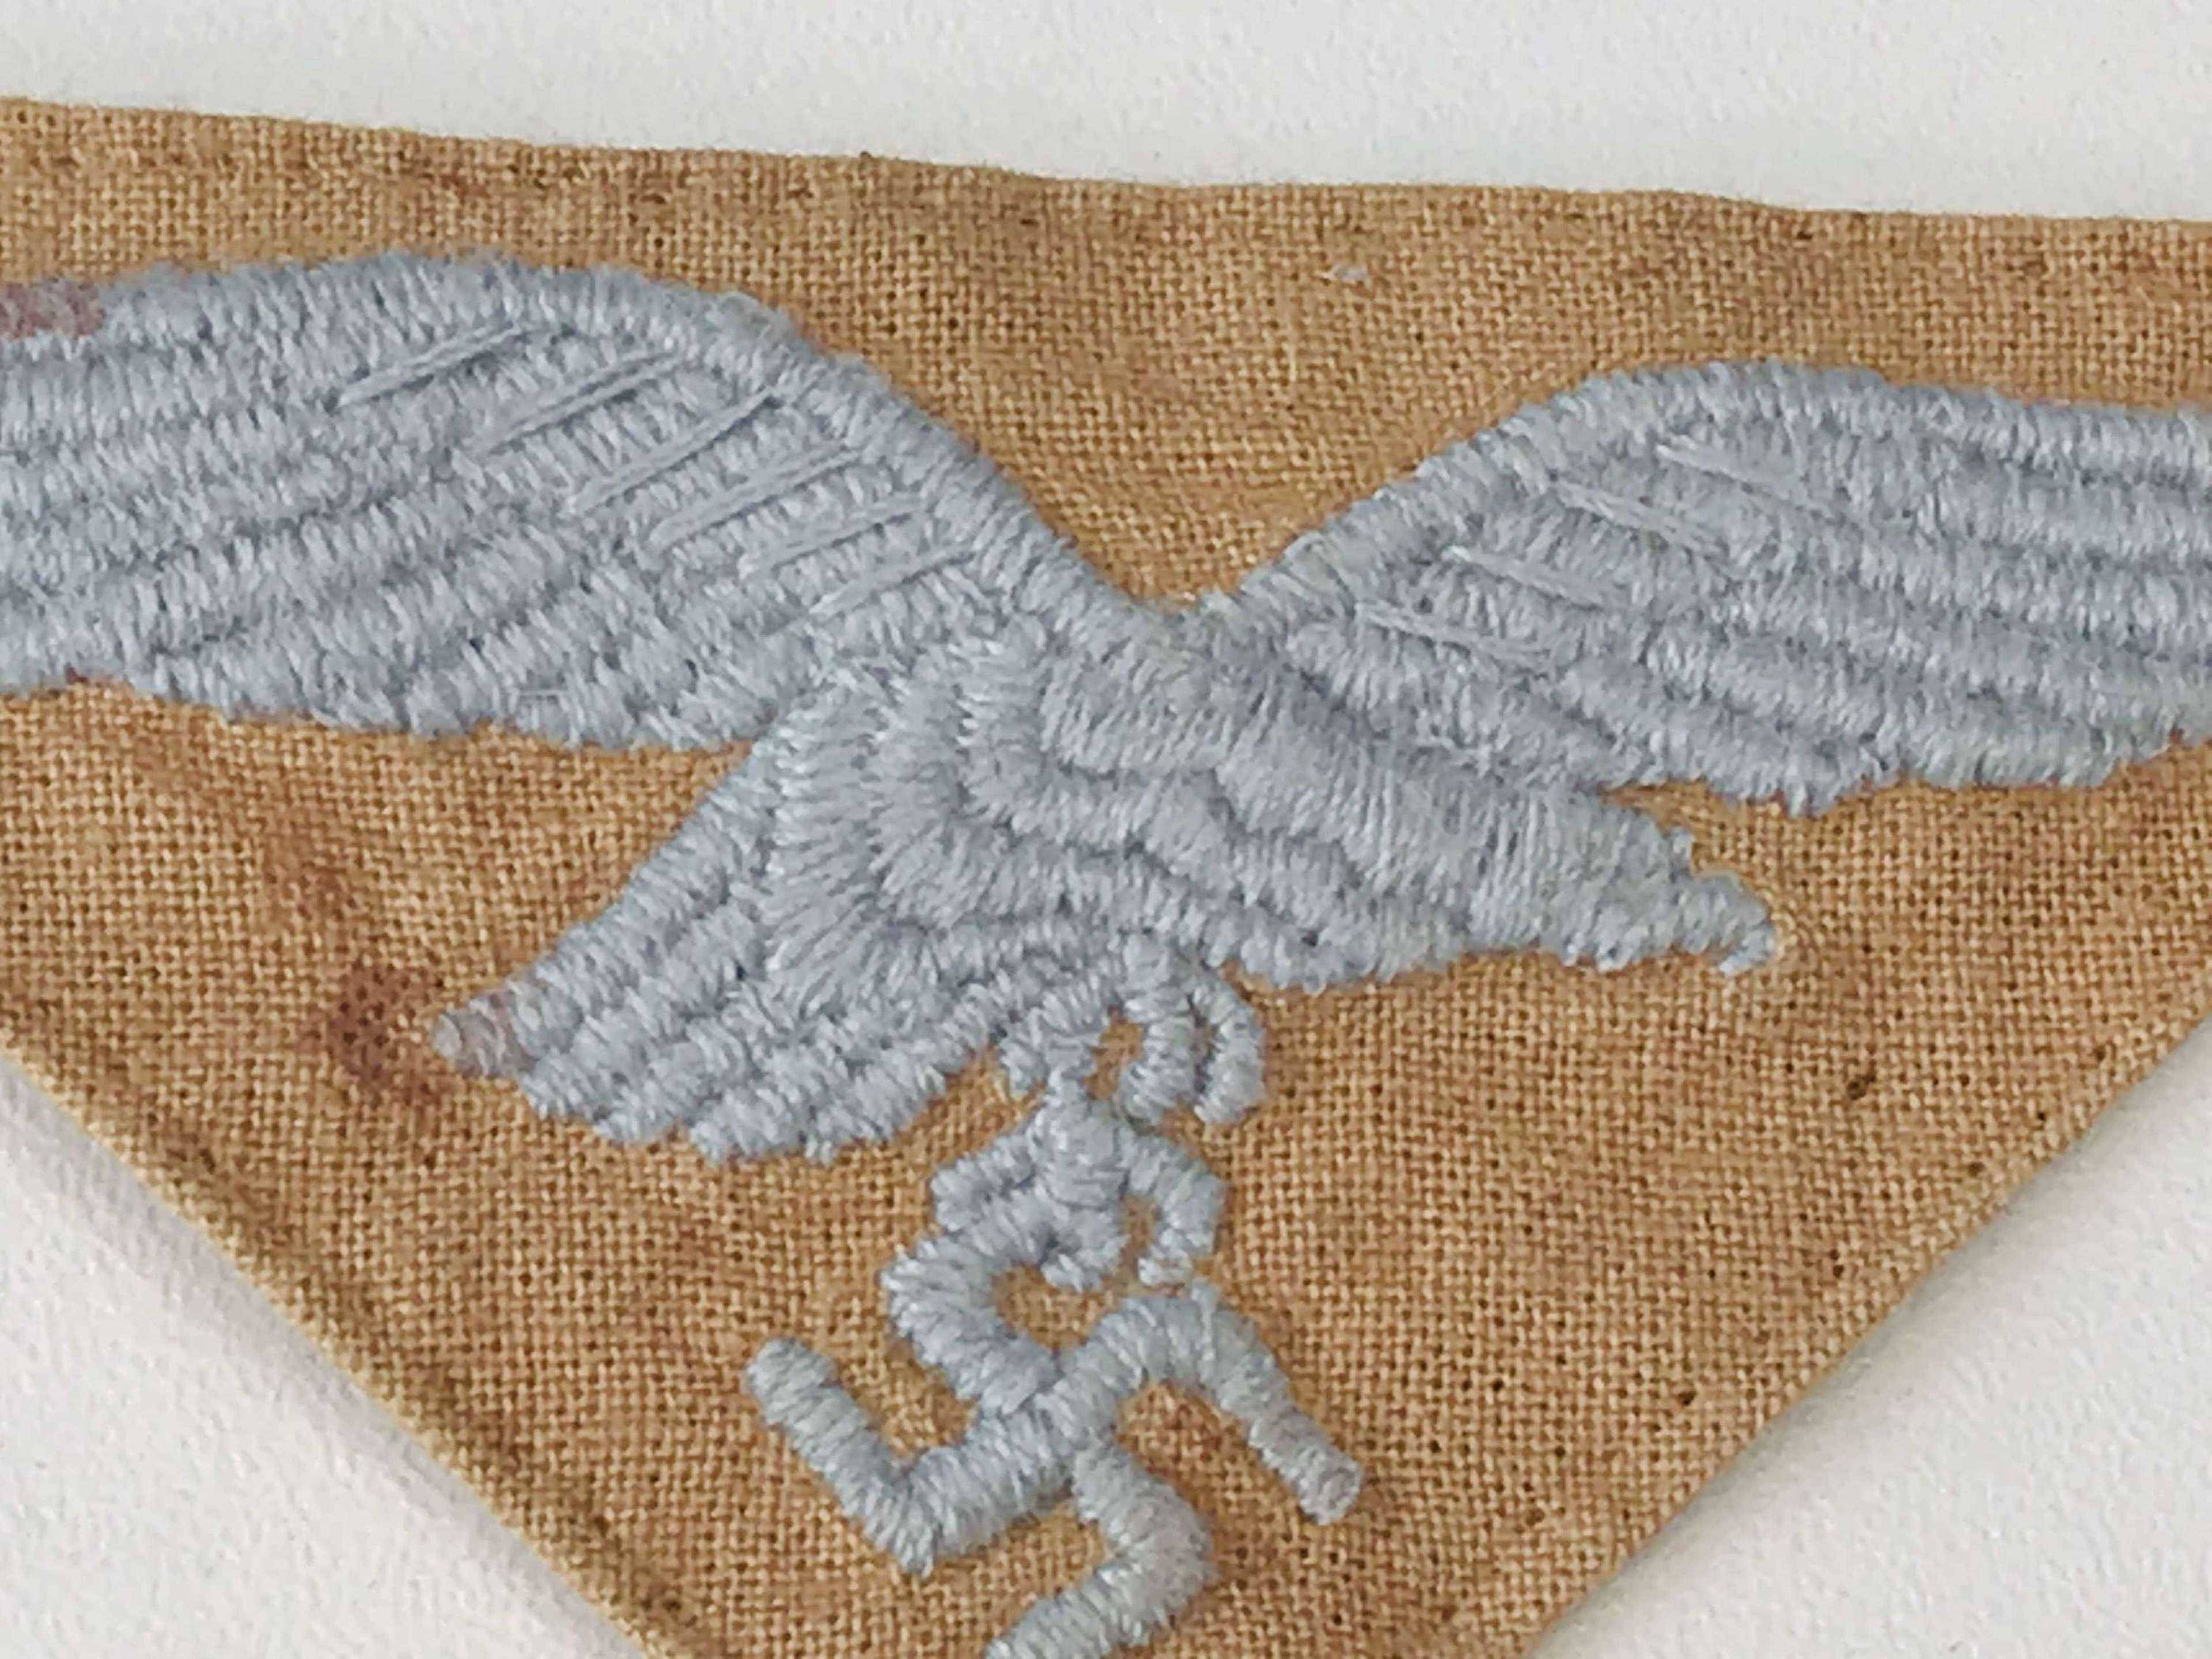 Luftwaffe tropical shirt eagle